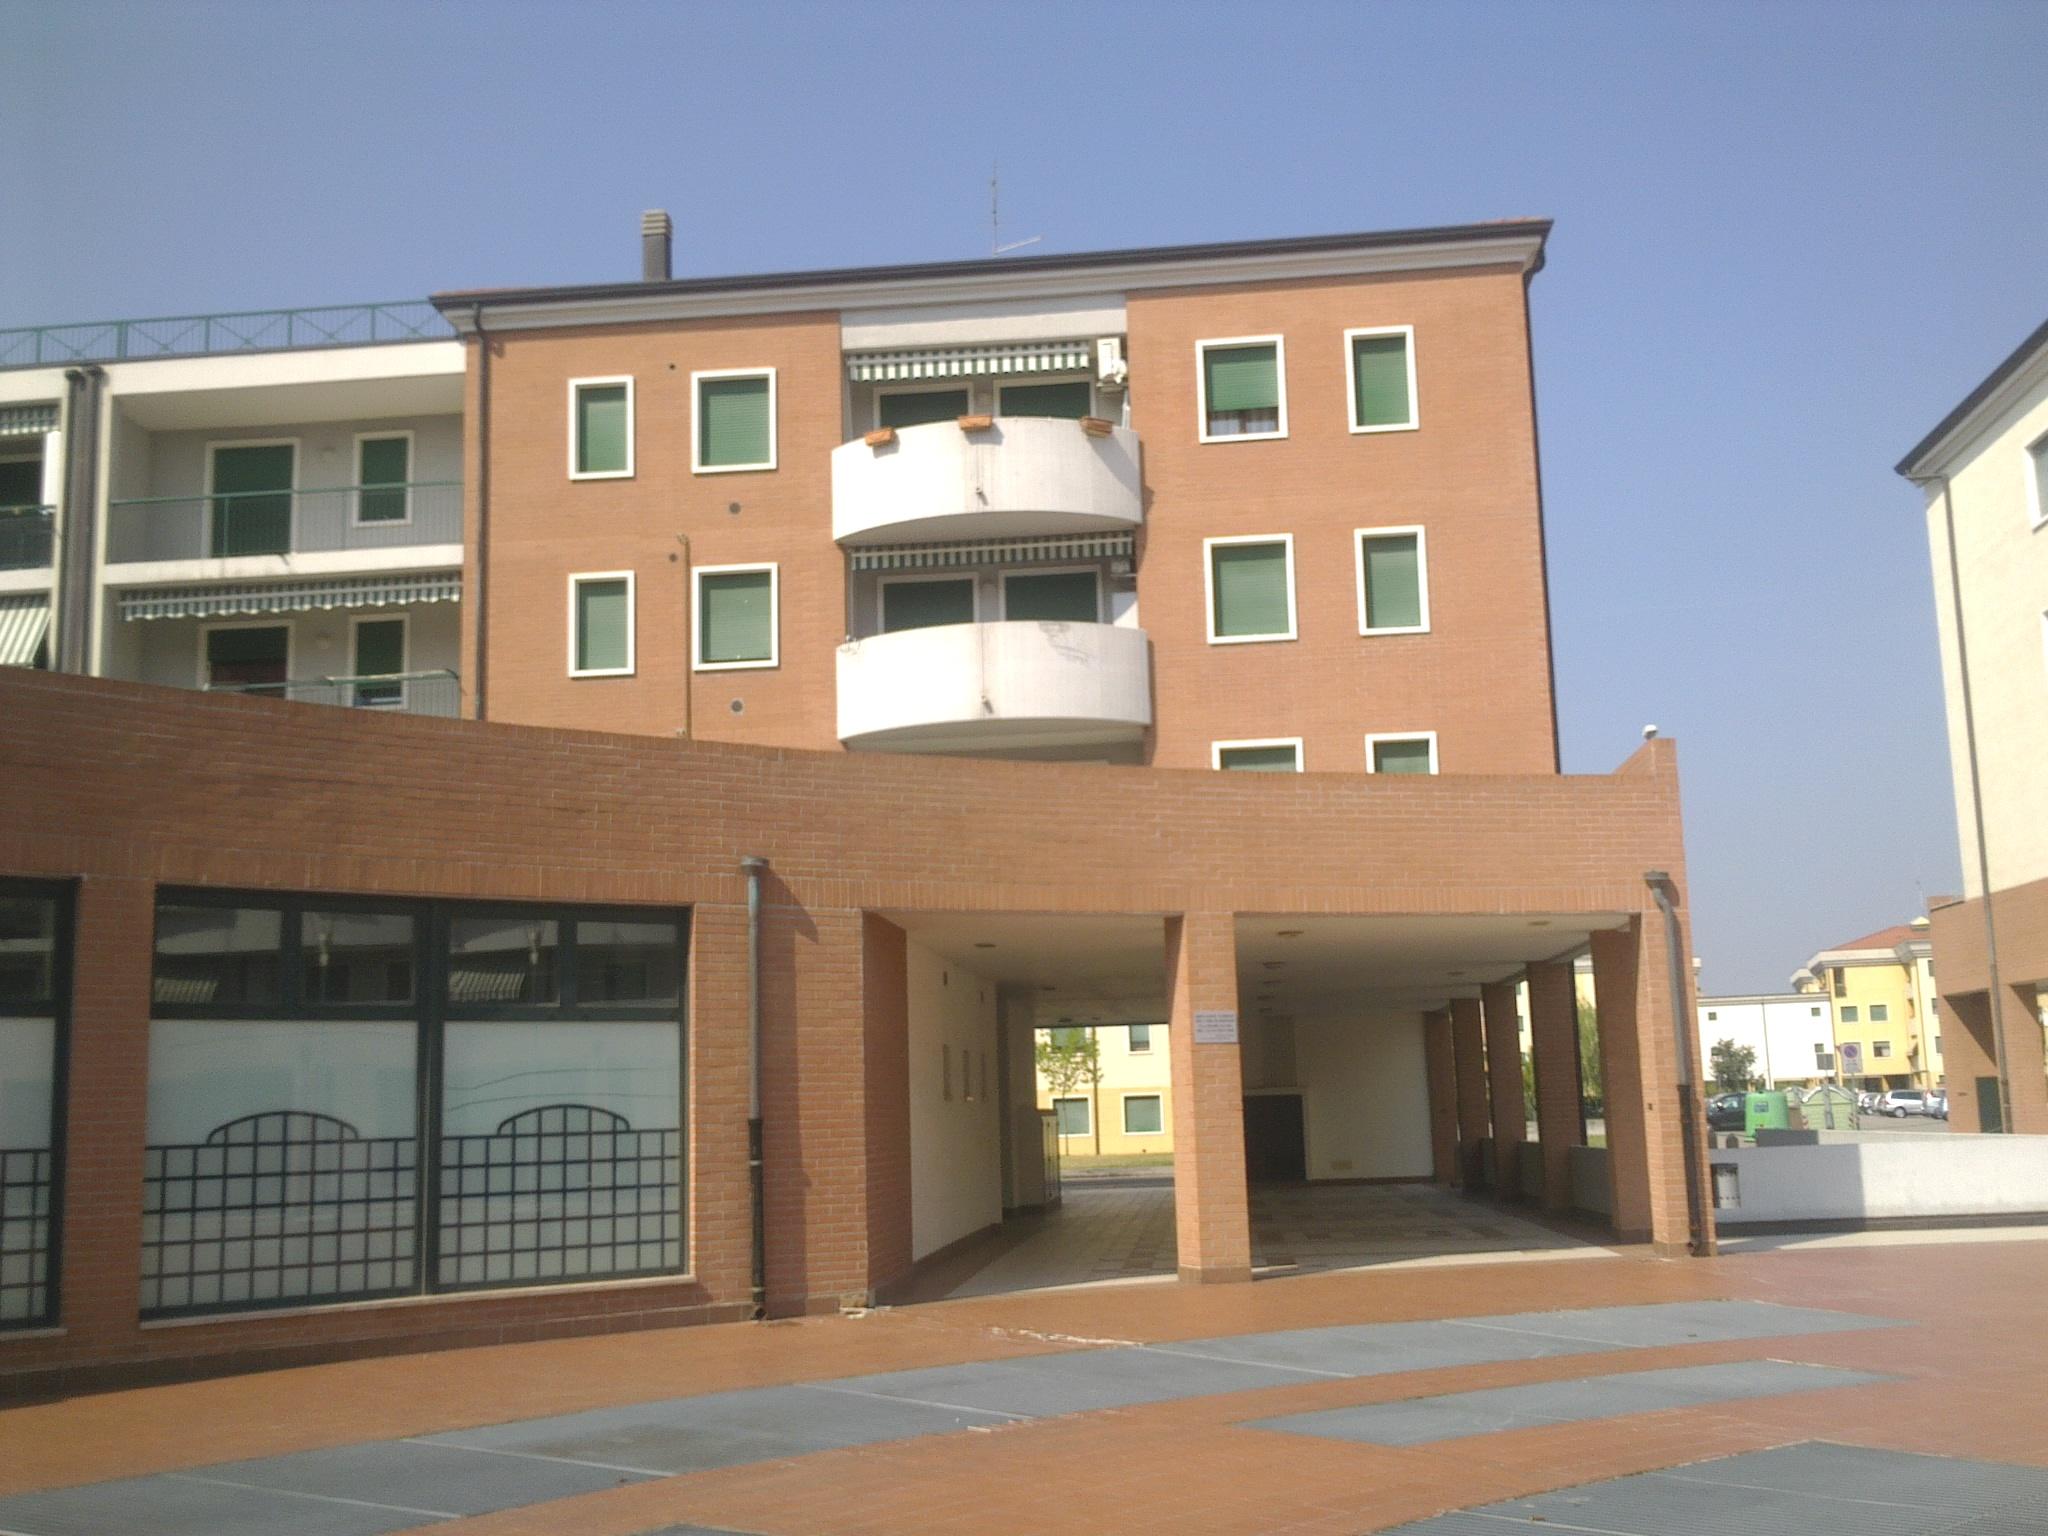 Ufficio in vendita a San Michele Extra - Fraz. di Verona